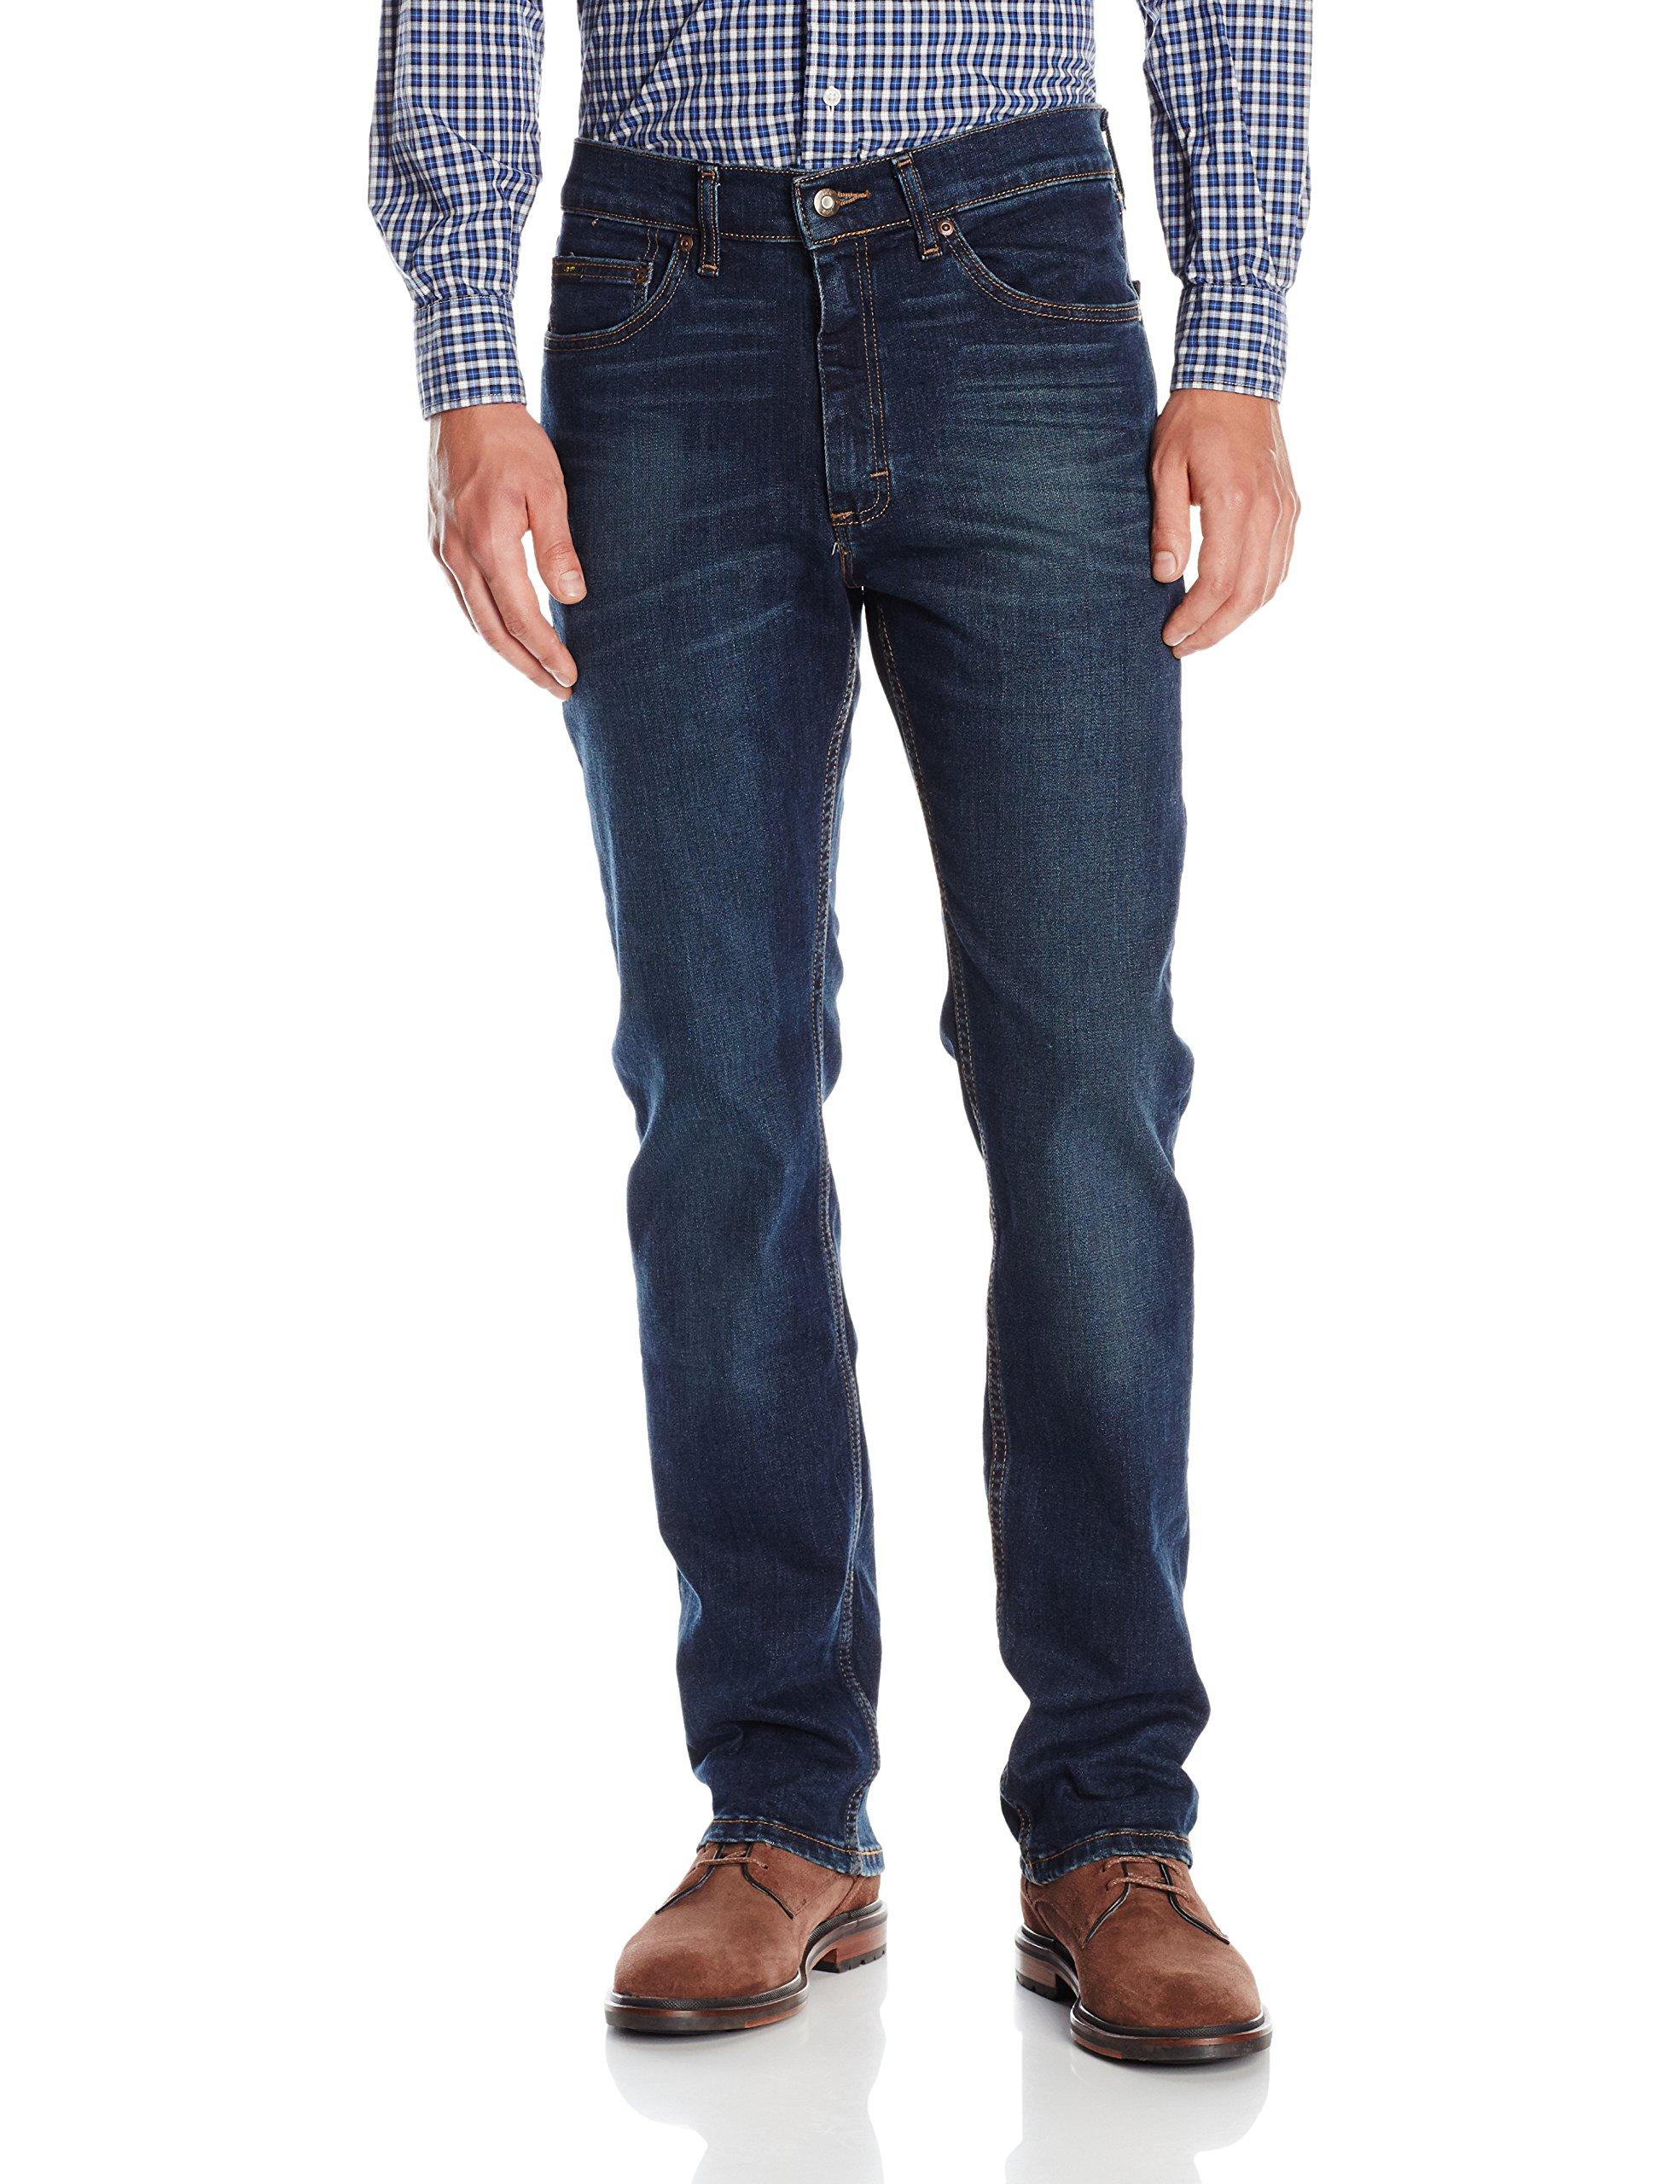 Lee 男式 精选款标准版型直筒牛仔裤